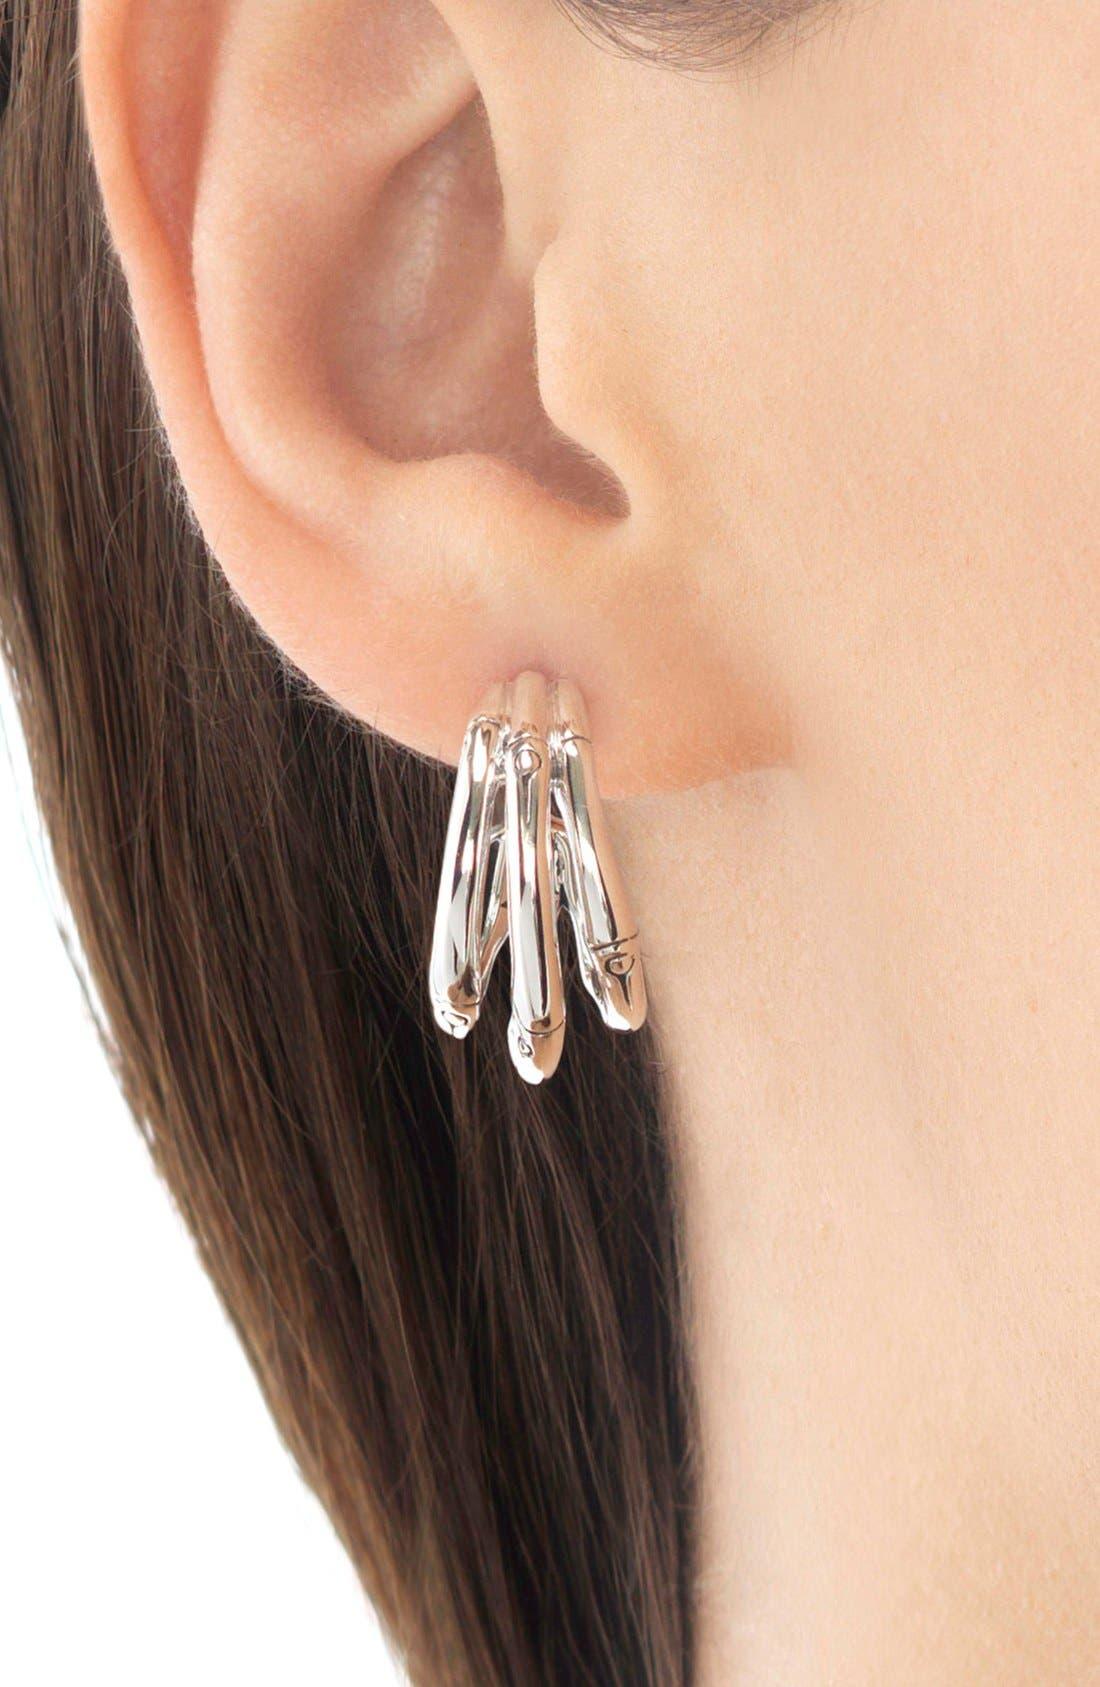 Bamboo Small Hoop Earrings,                             Alternate thumbnail 2, color,                             SILVER